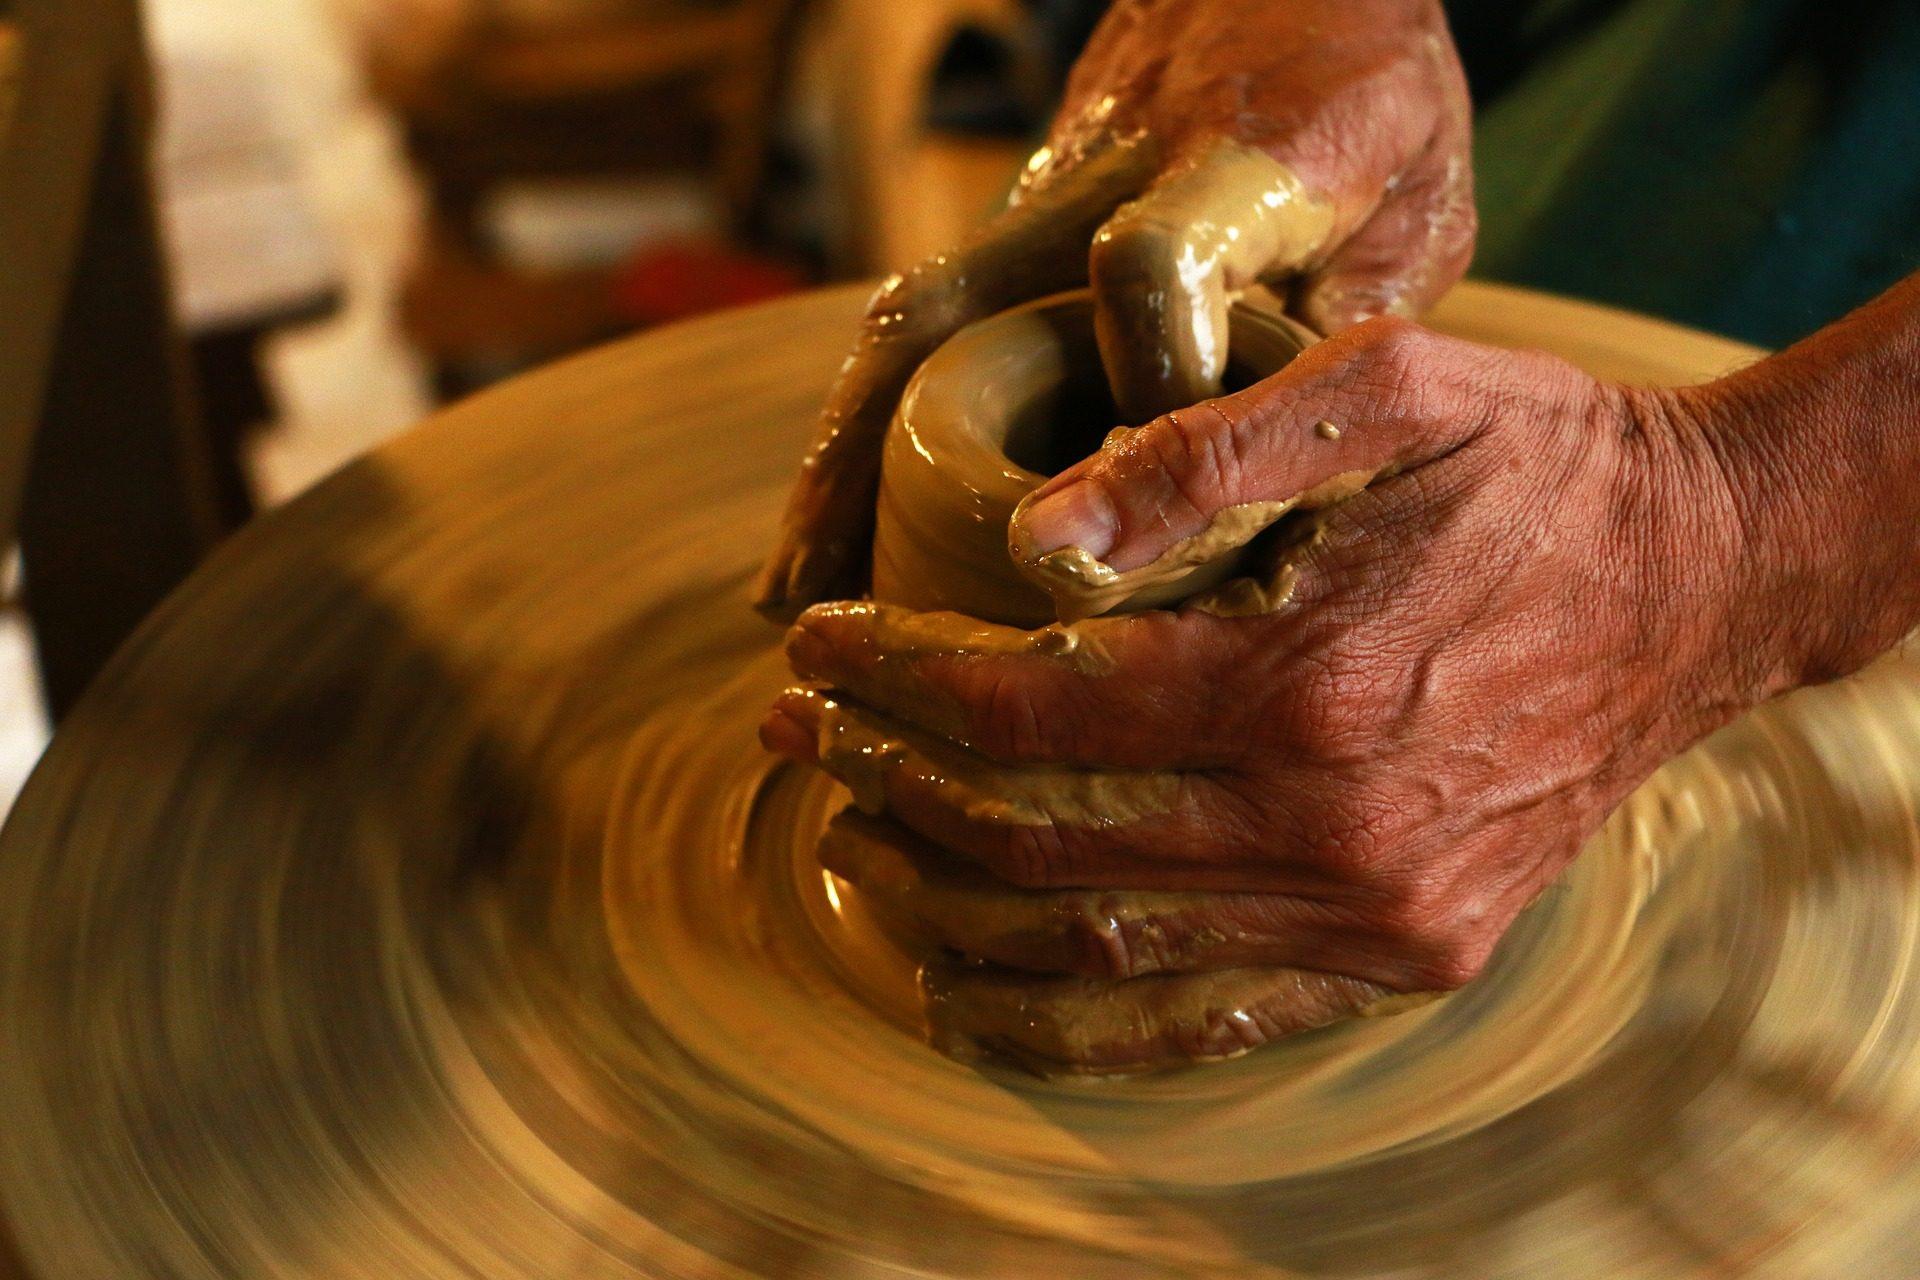 mãos, lama, alfarería, artesanato, torno - Papéis de parede HD - Professor-falken.com